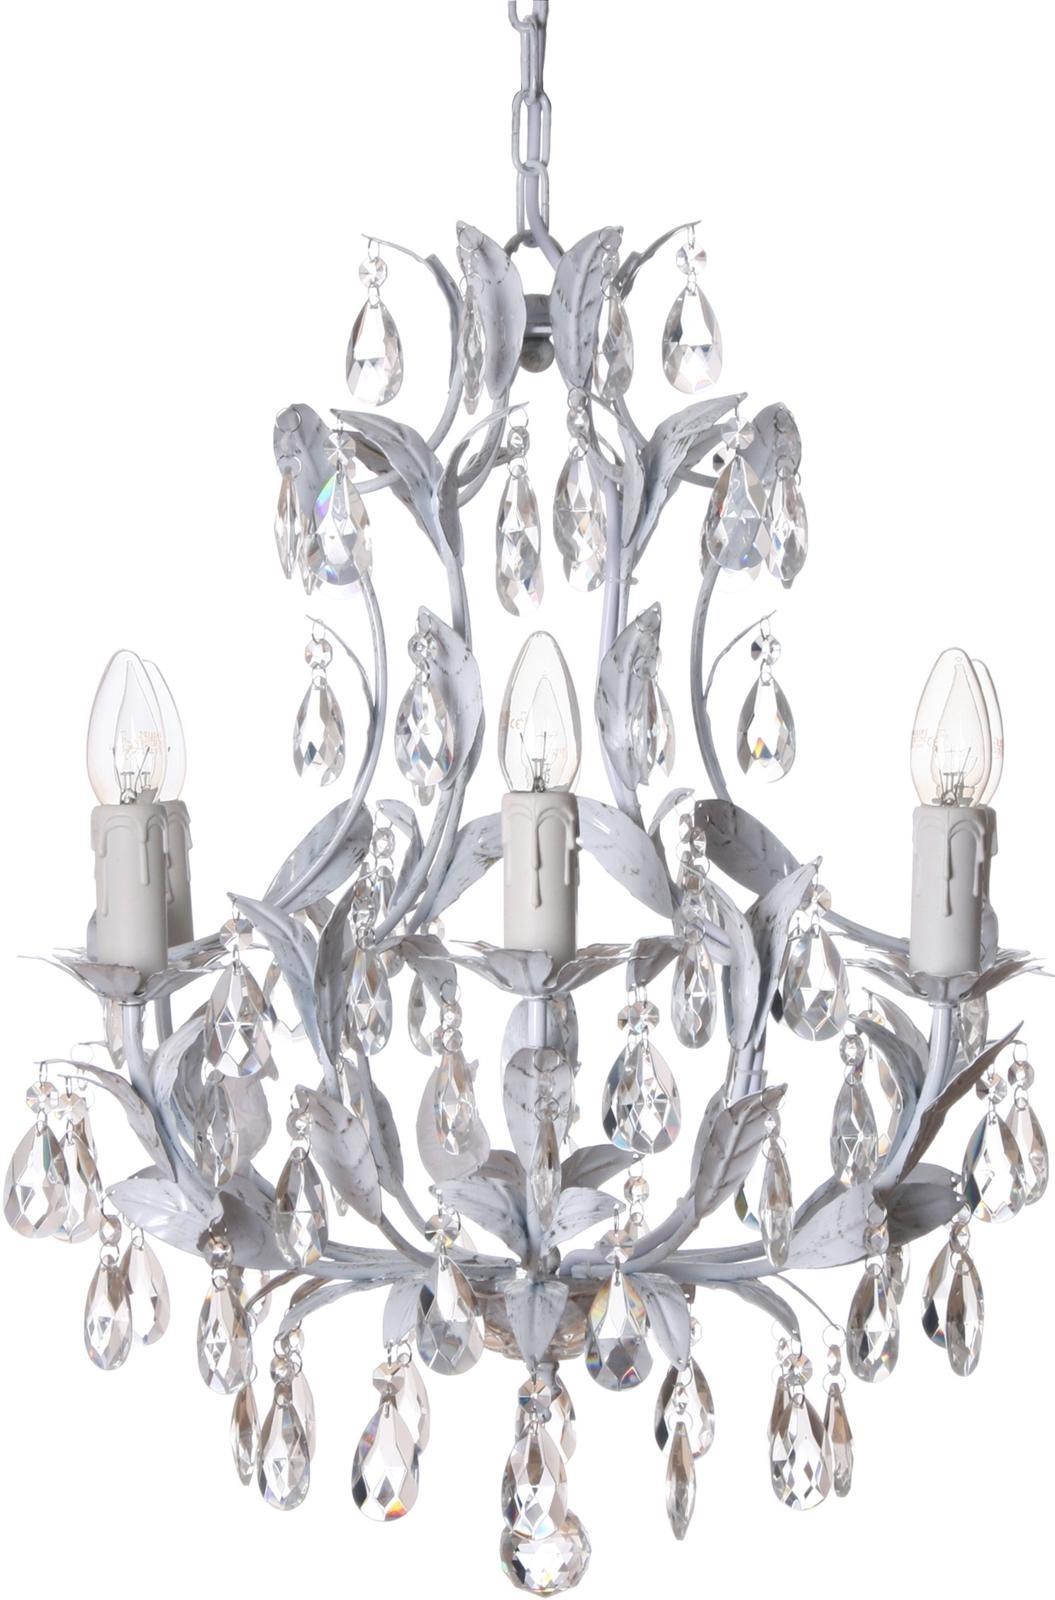 LED-kattovalaisin Muller Licht Prisma, T8, 2x18W, IP20, 1237x164x59mm, metalli/akryyli, valkoinen